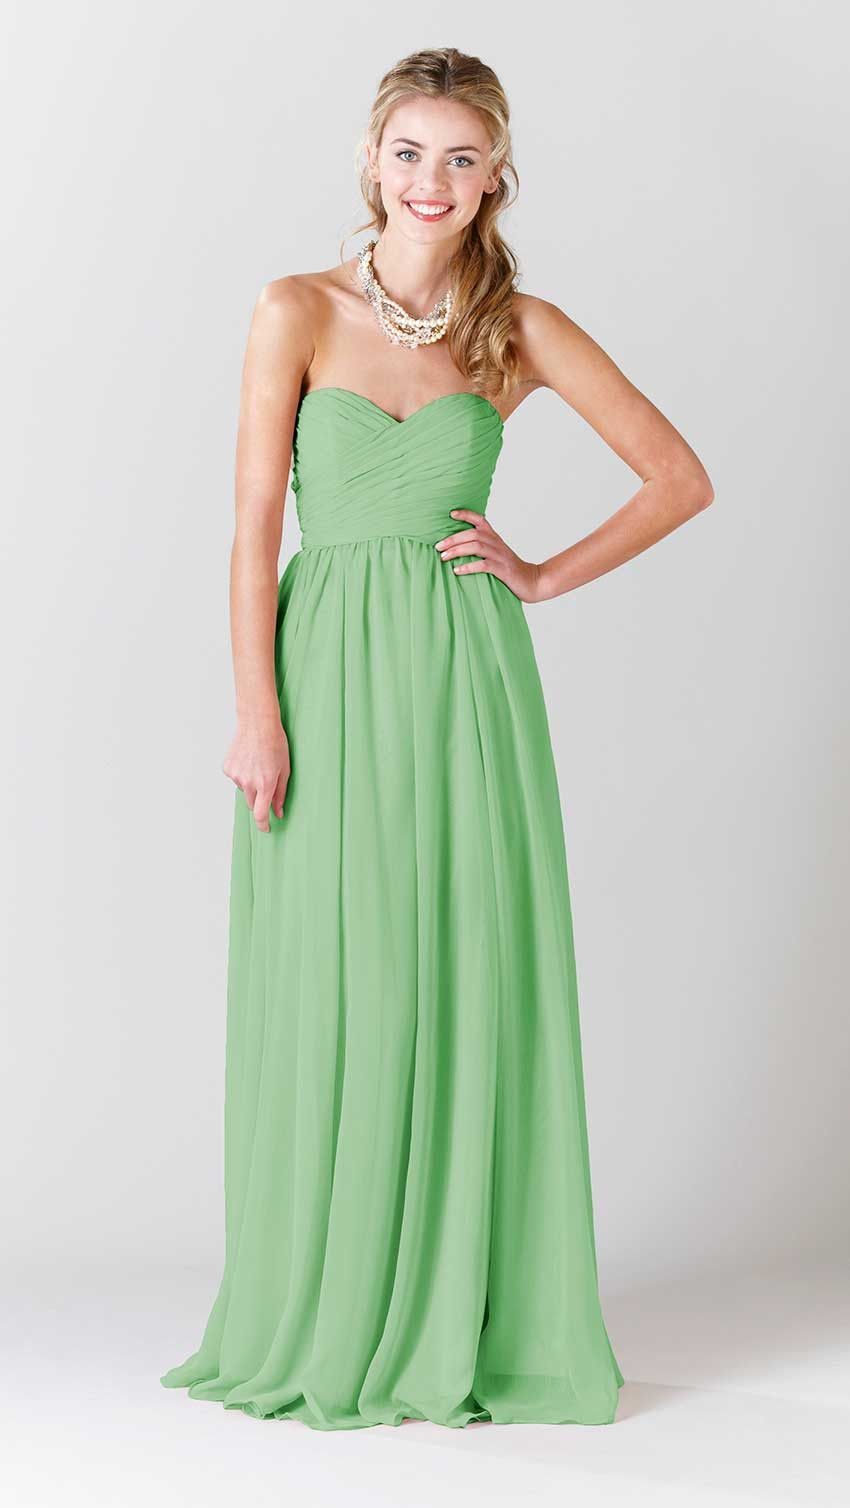 Kennedy blue olivia pinterest chiffon bridesmaid dresses green